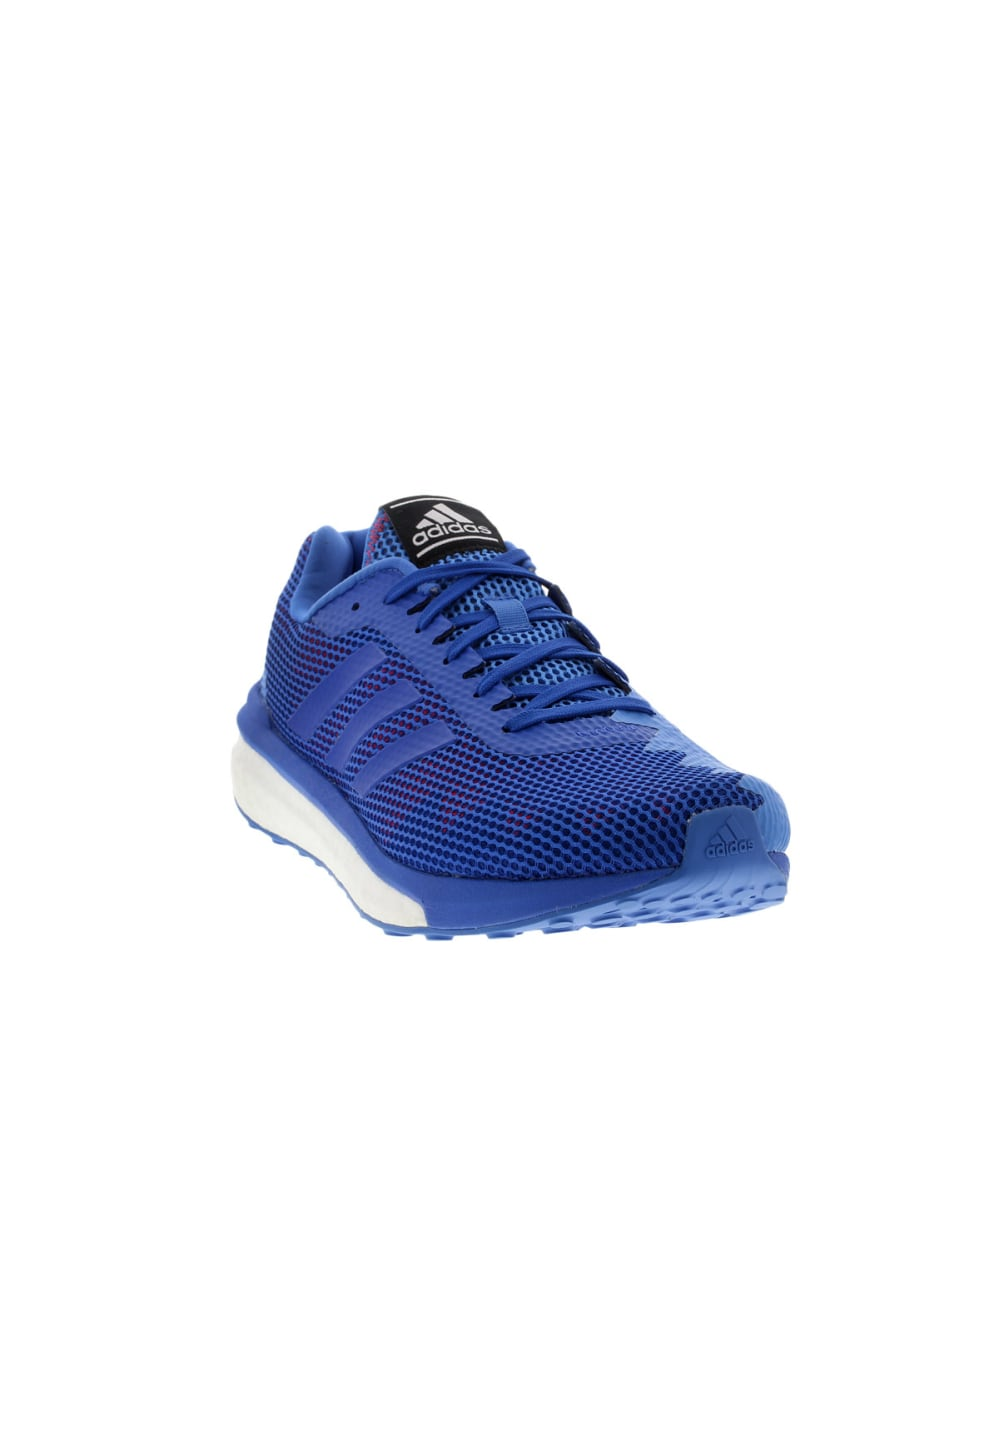 hot sale online 876f4 4b949 adidas Vengeful - Running shoes for Men - Blue